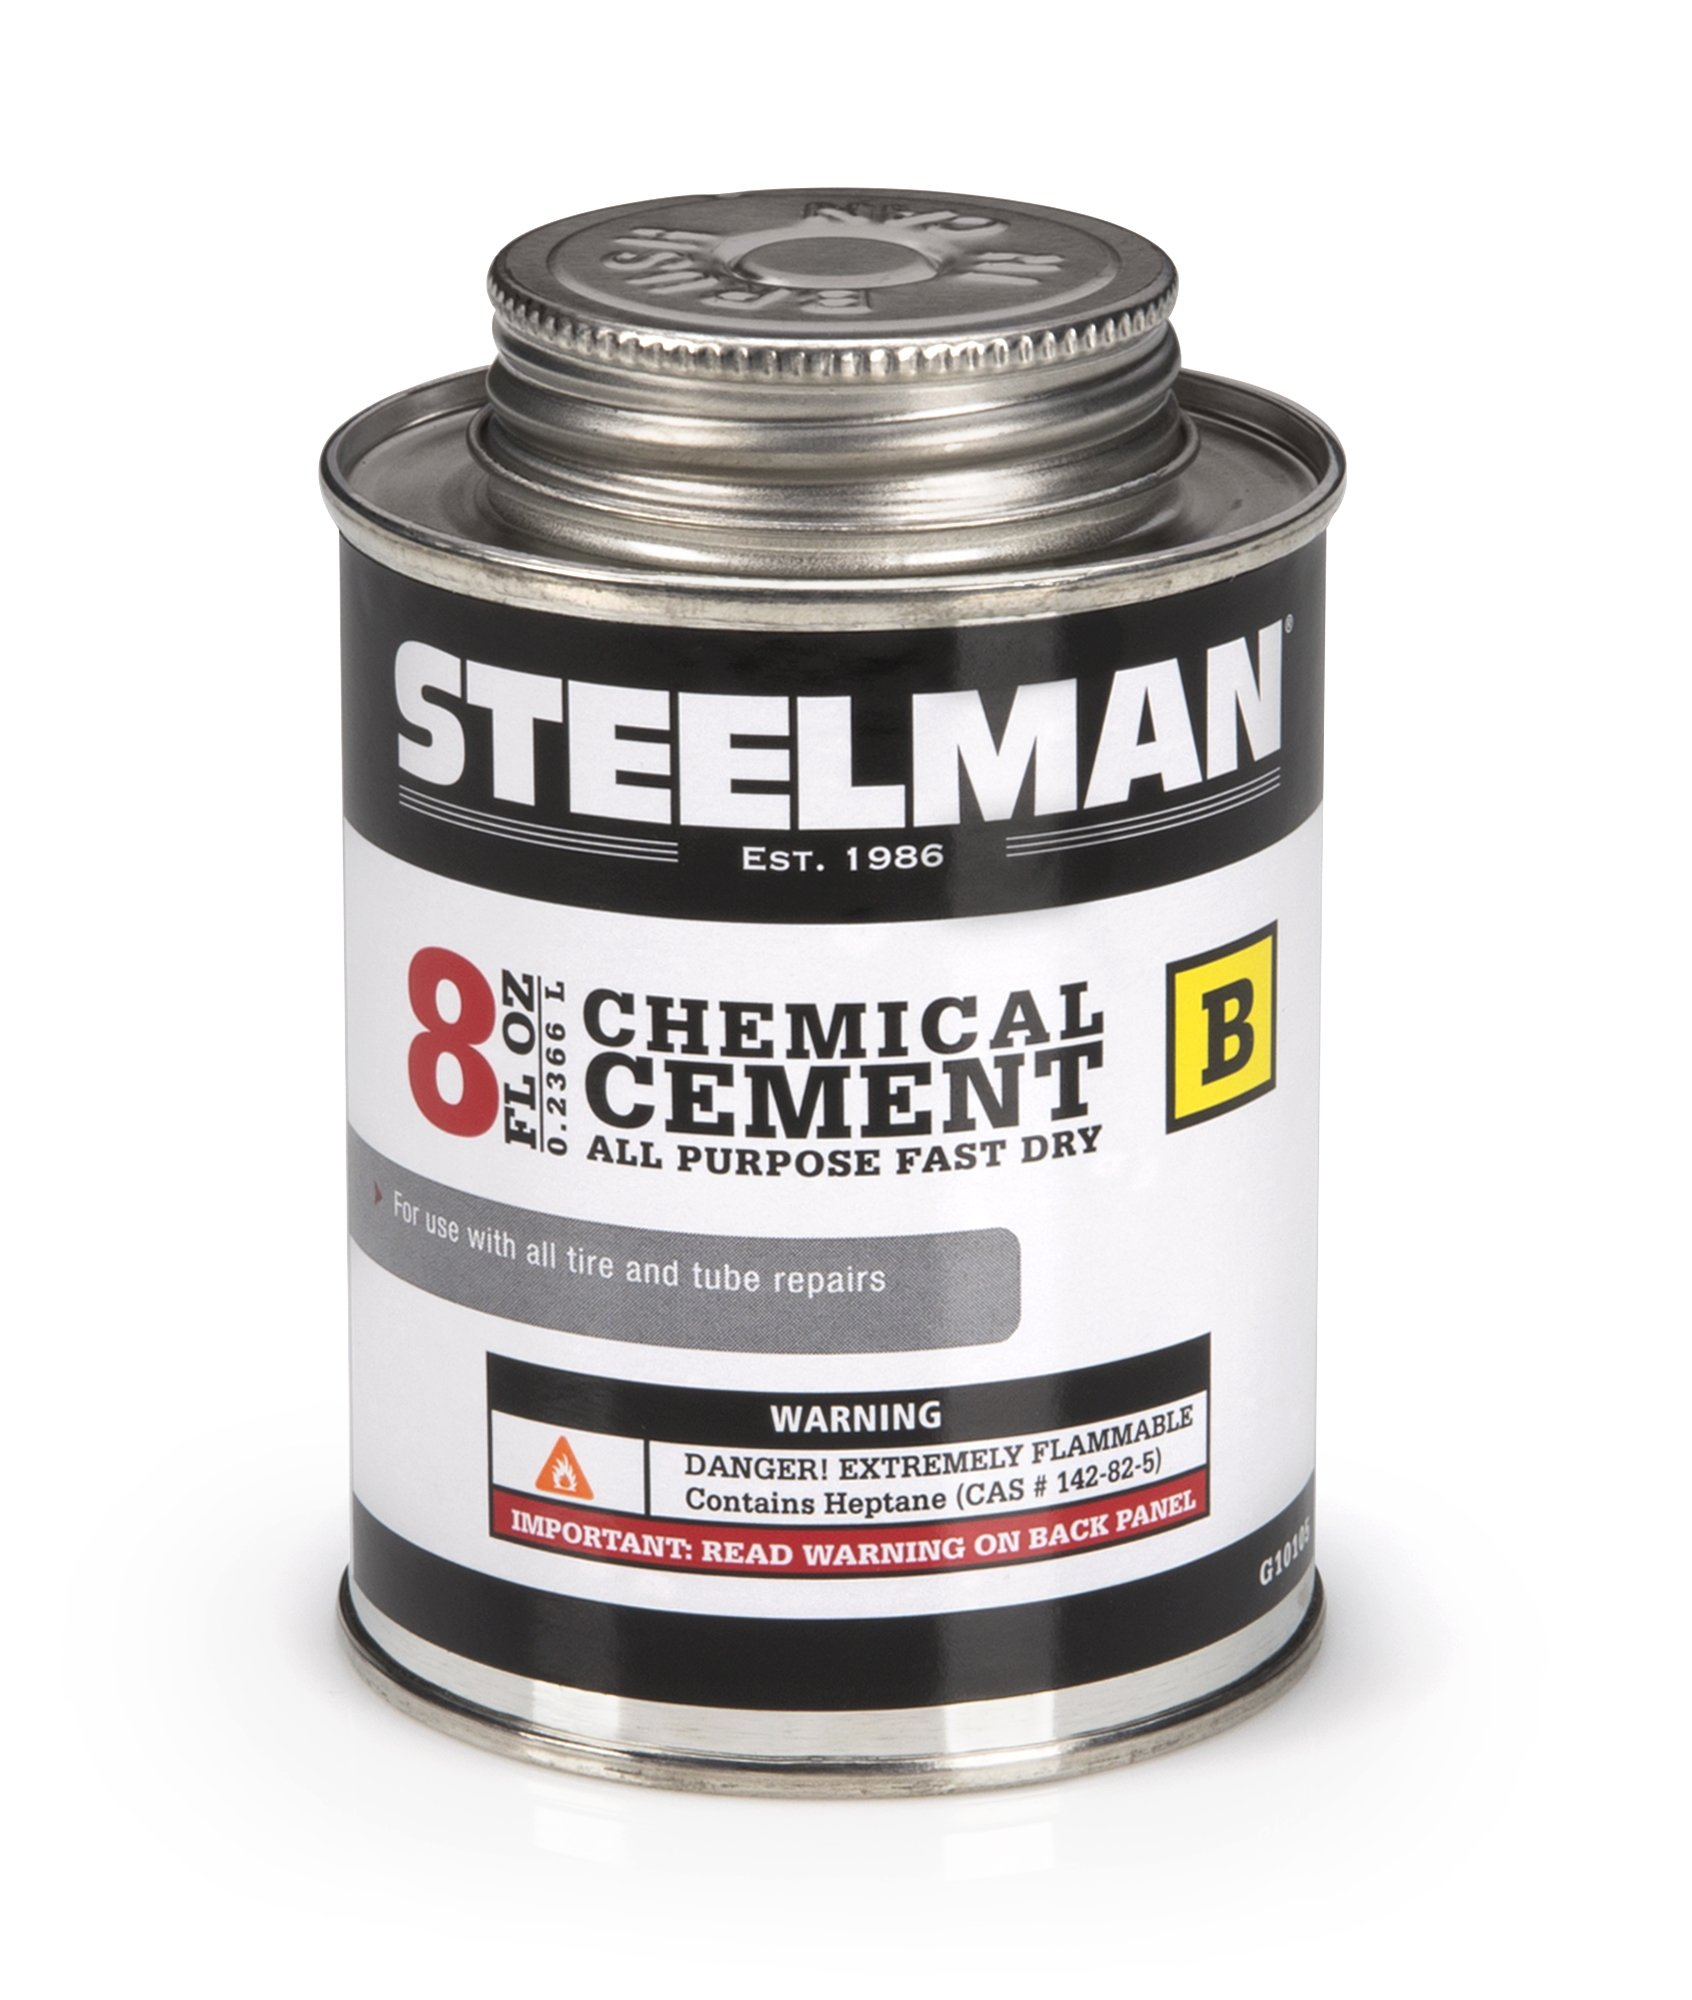 Steelman G10105 Chemical Vulcanizing Cement - 8oz.